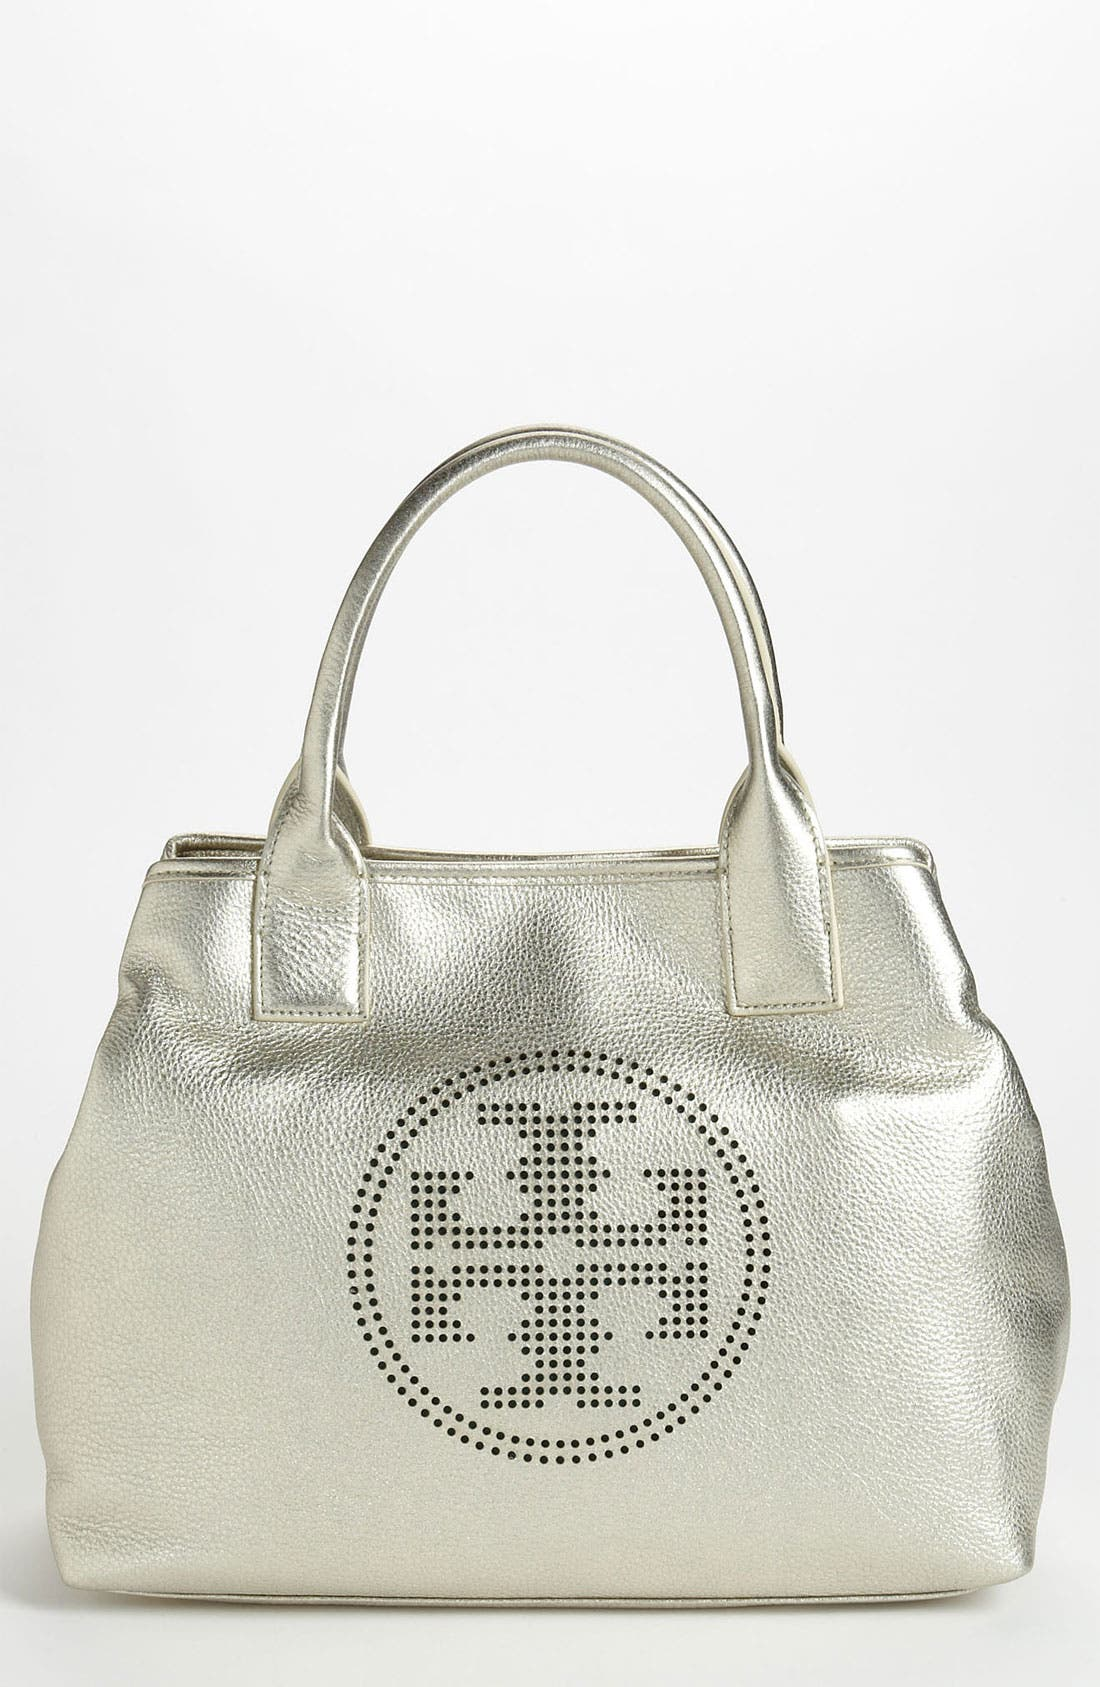 Main Image - Tory Burch 'Small' Perforated Logo Metallic Classic Tote